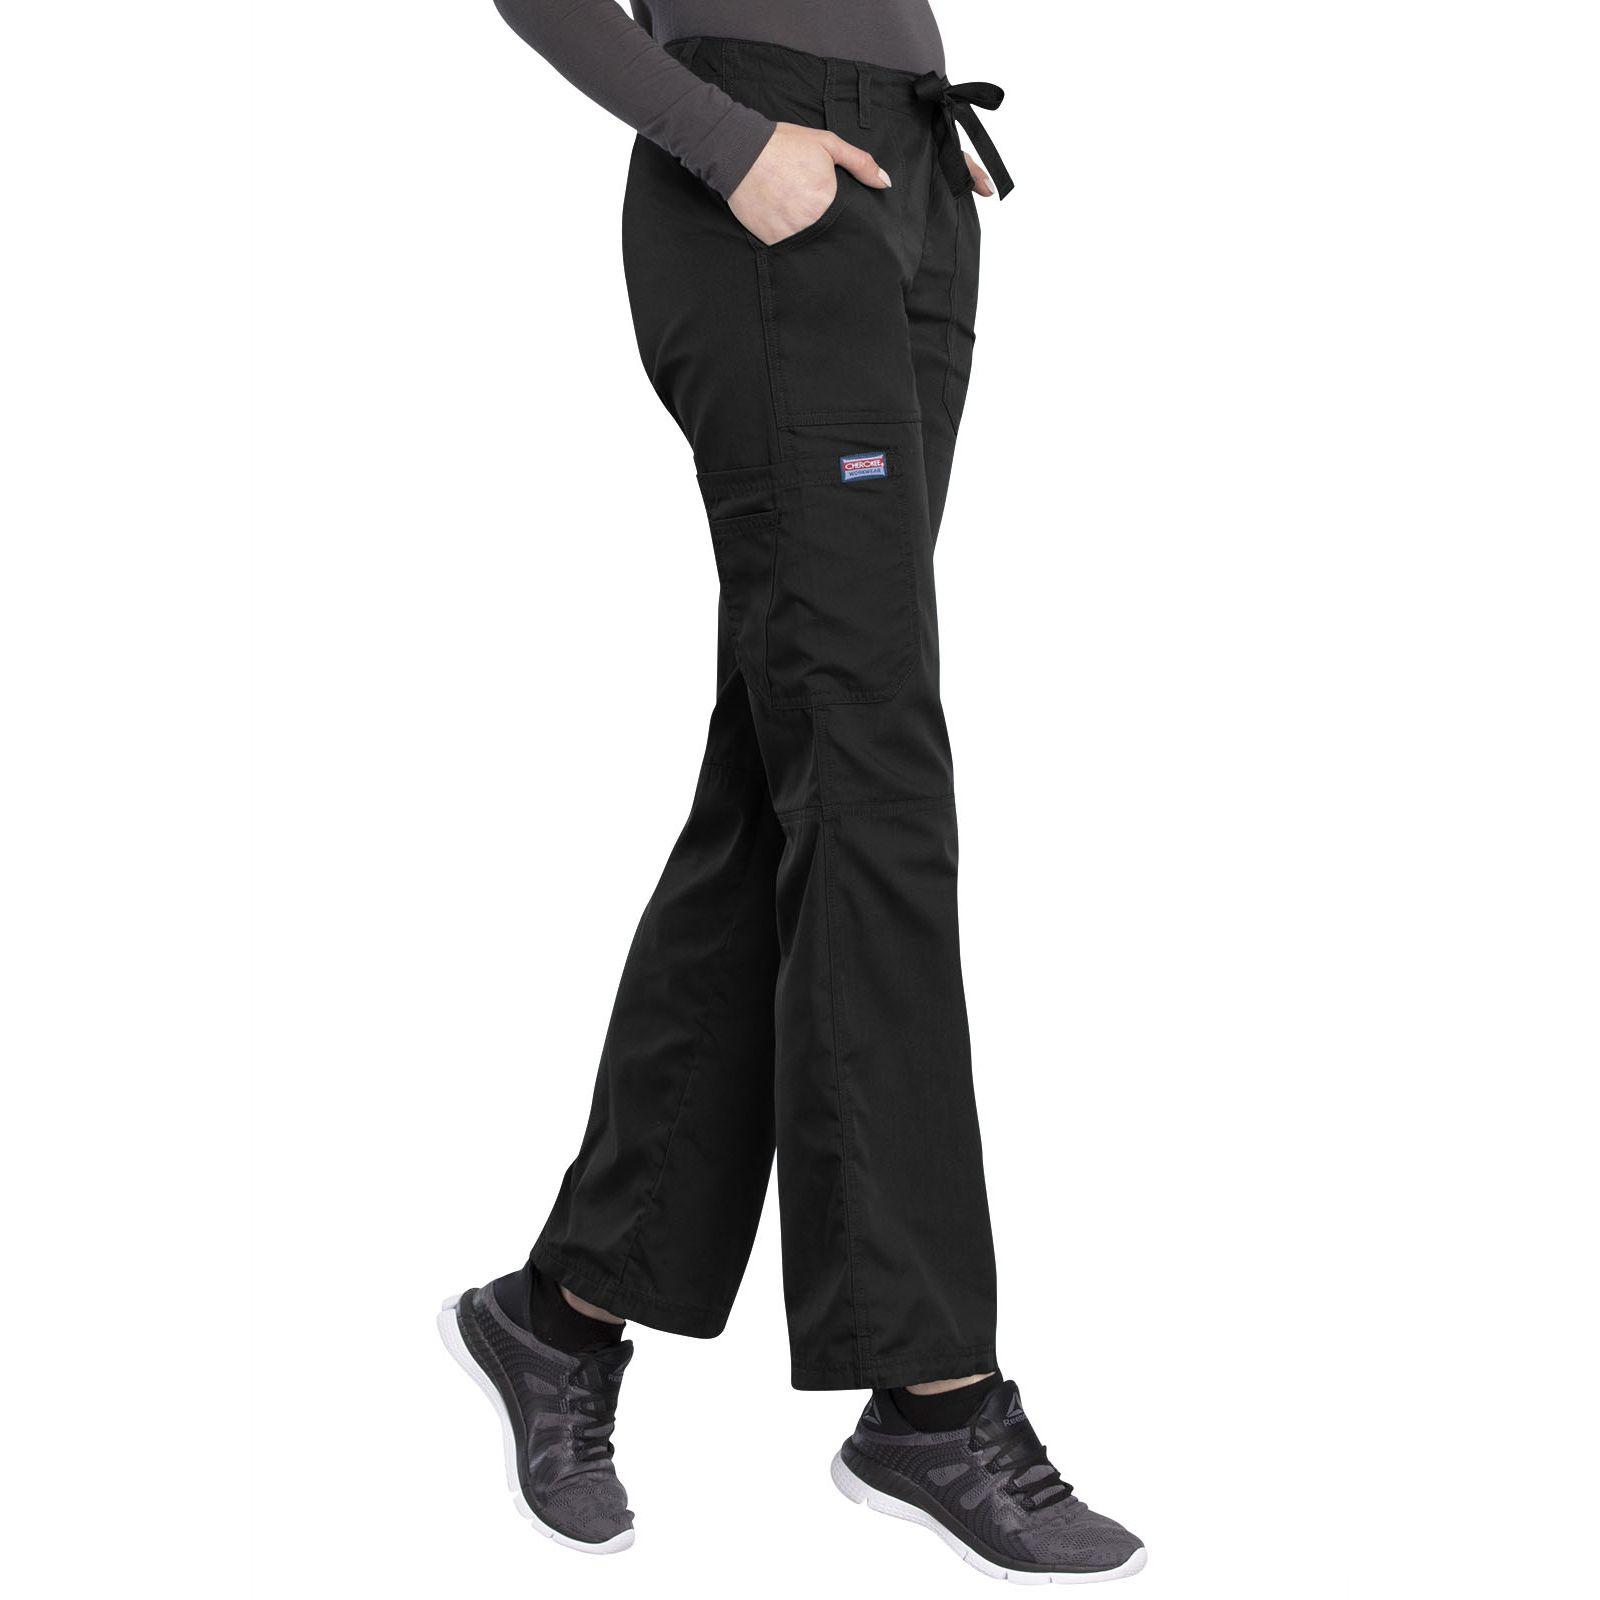 Women's pants and elastic strap back Cherokee